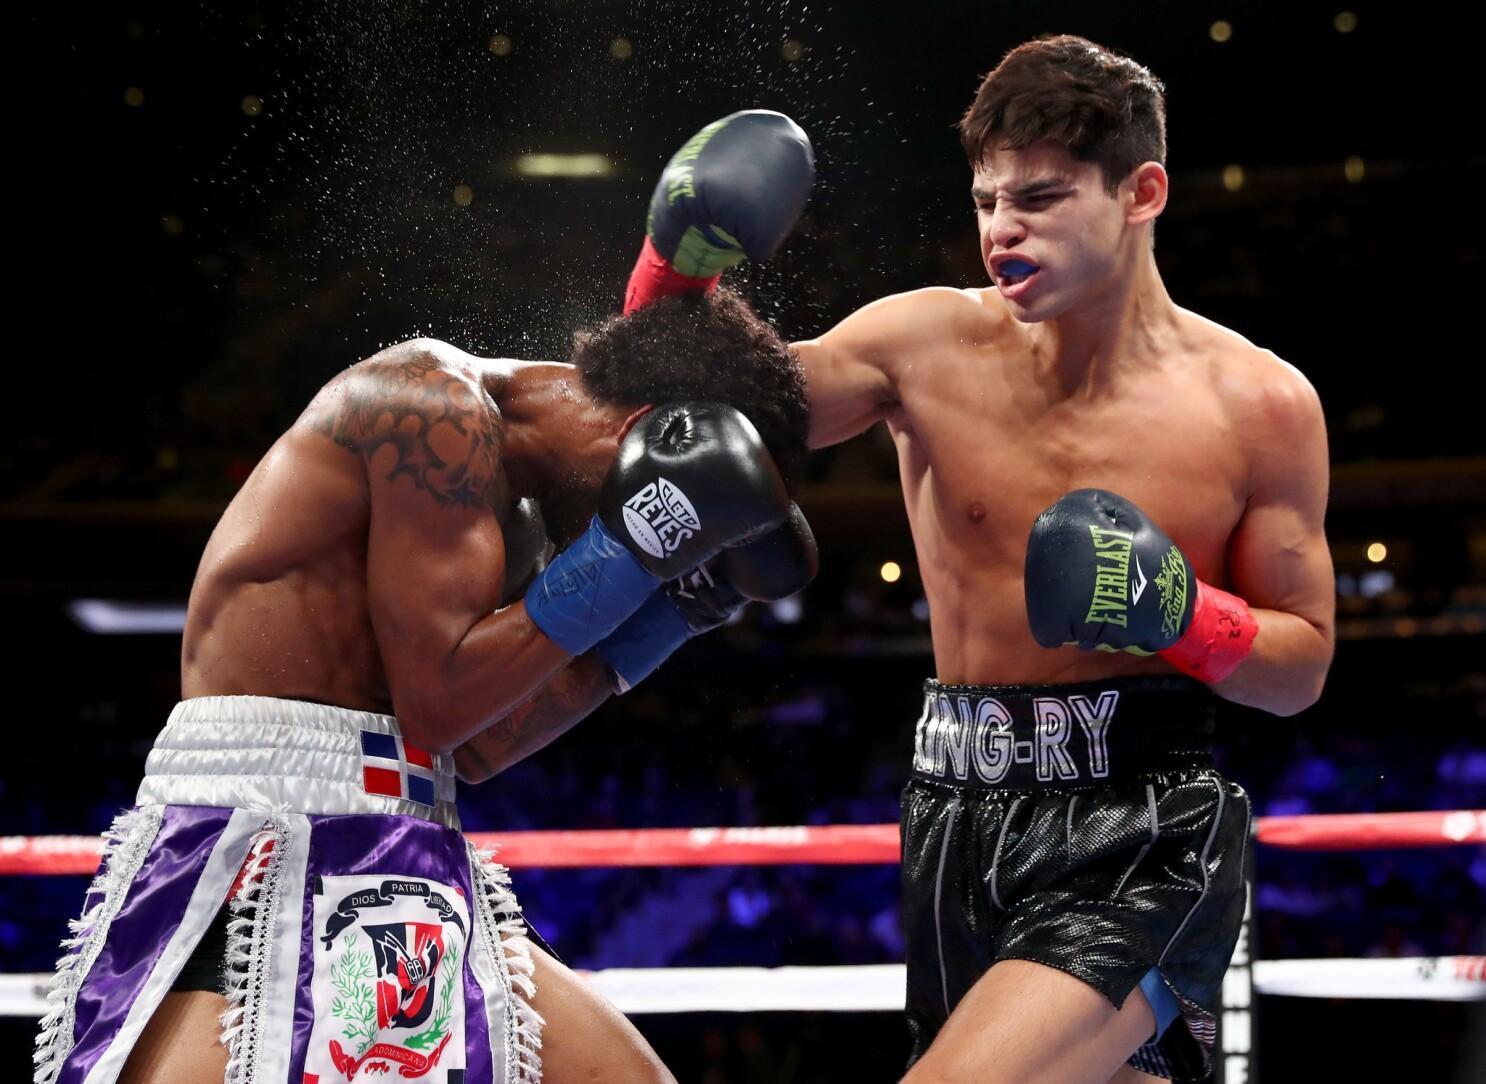 Jaime Munguia, Ryan Garcia headline Sept. 14 bouts in Carson